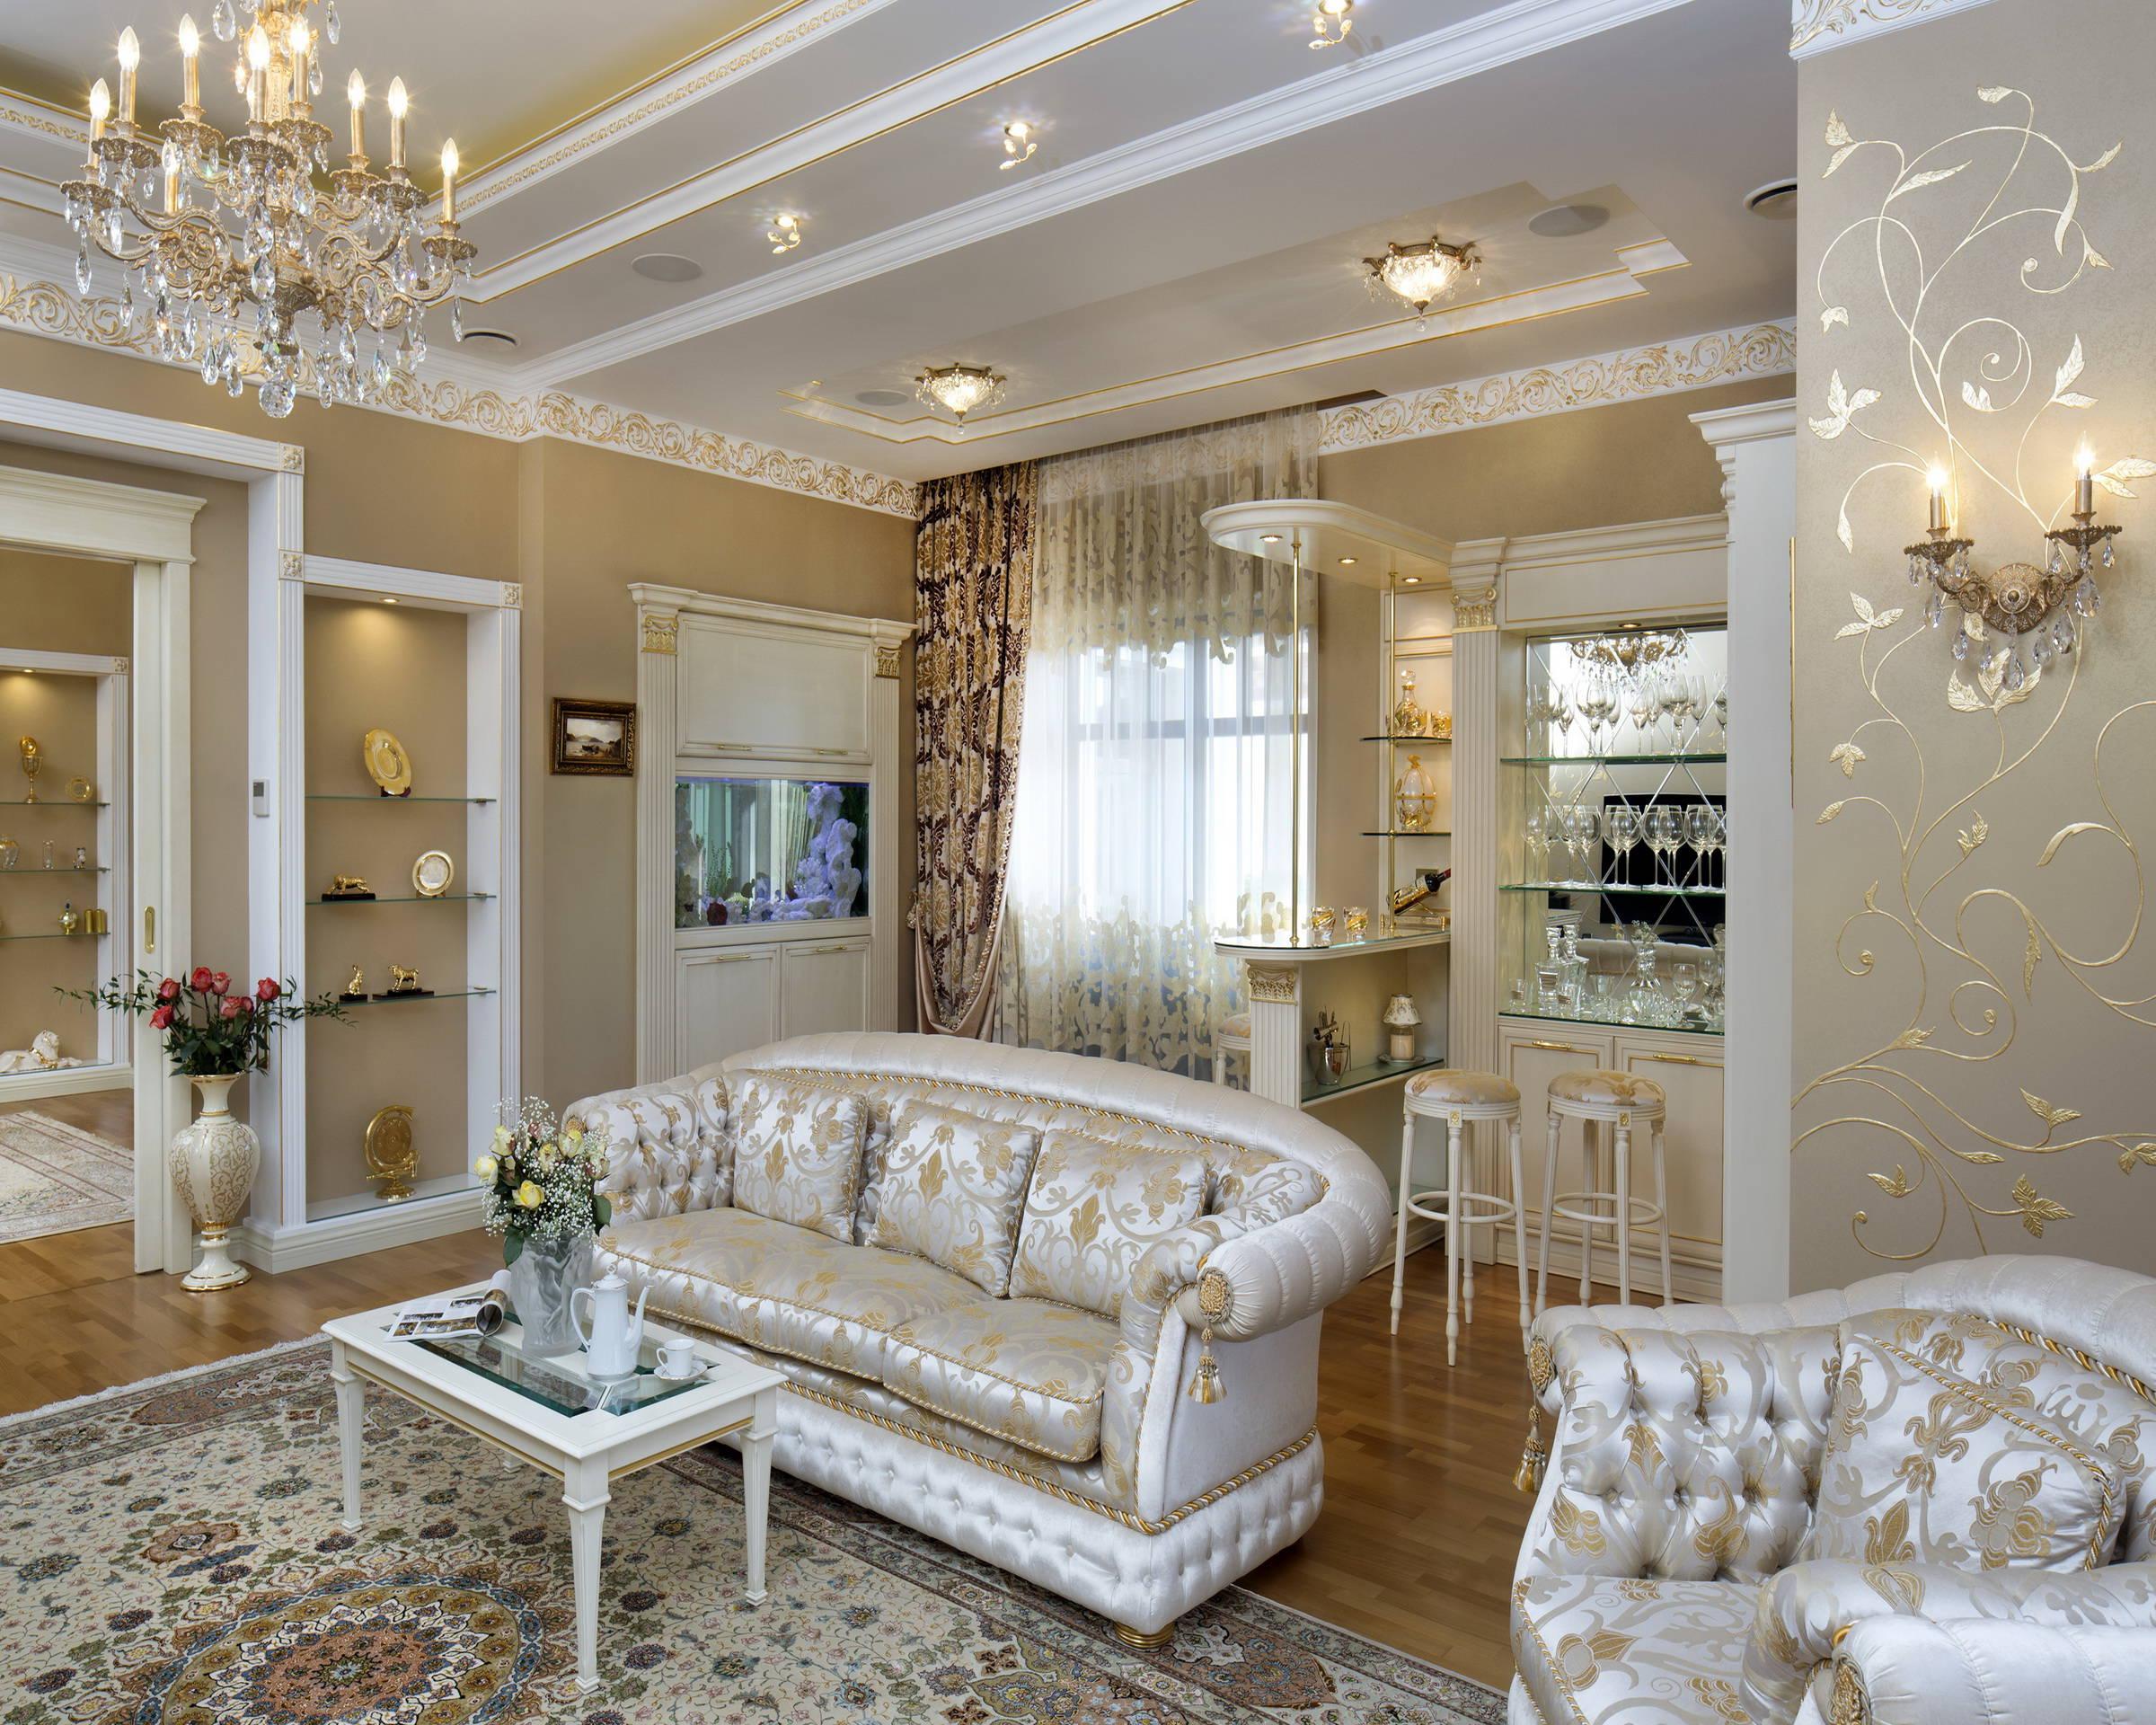 Дизайн дома внутри классический дизайн всех комнат